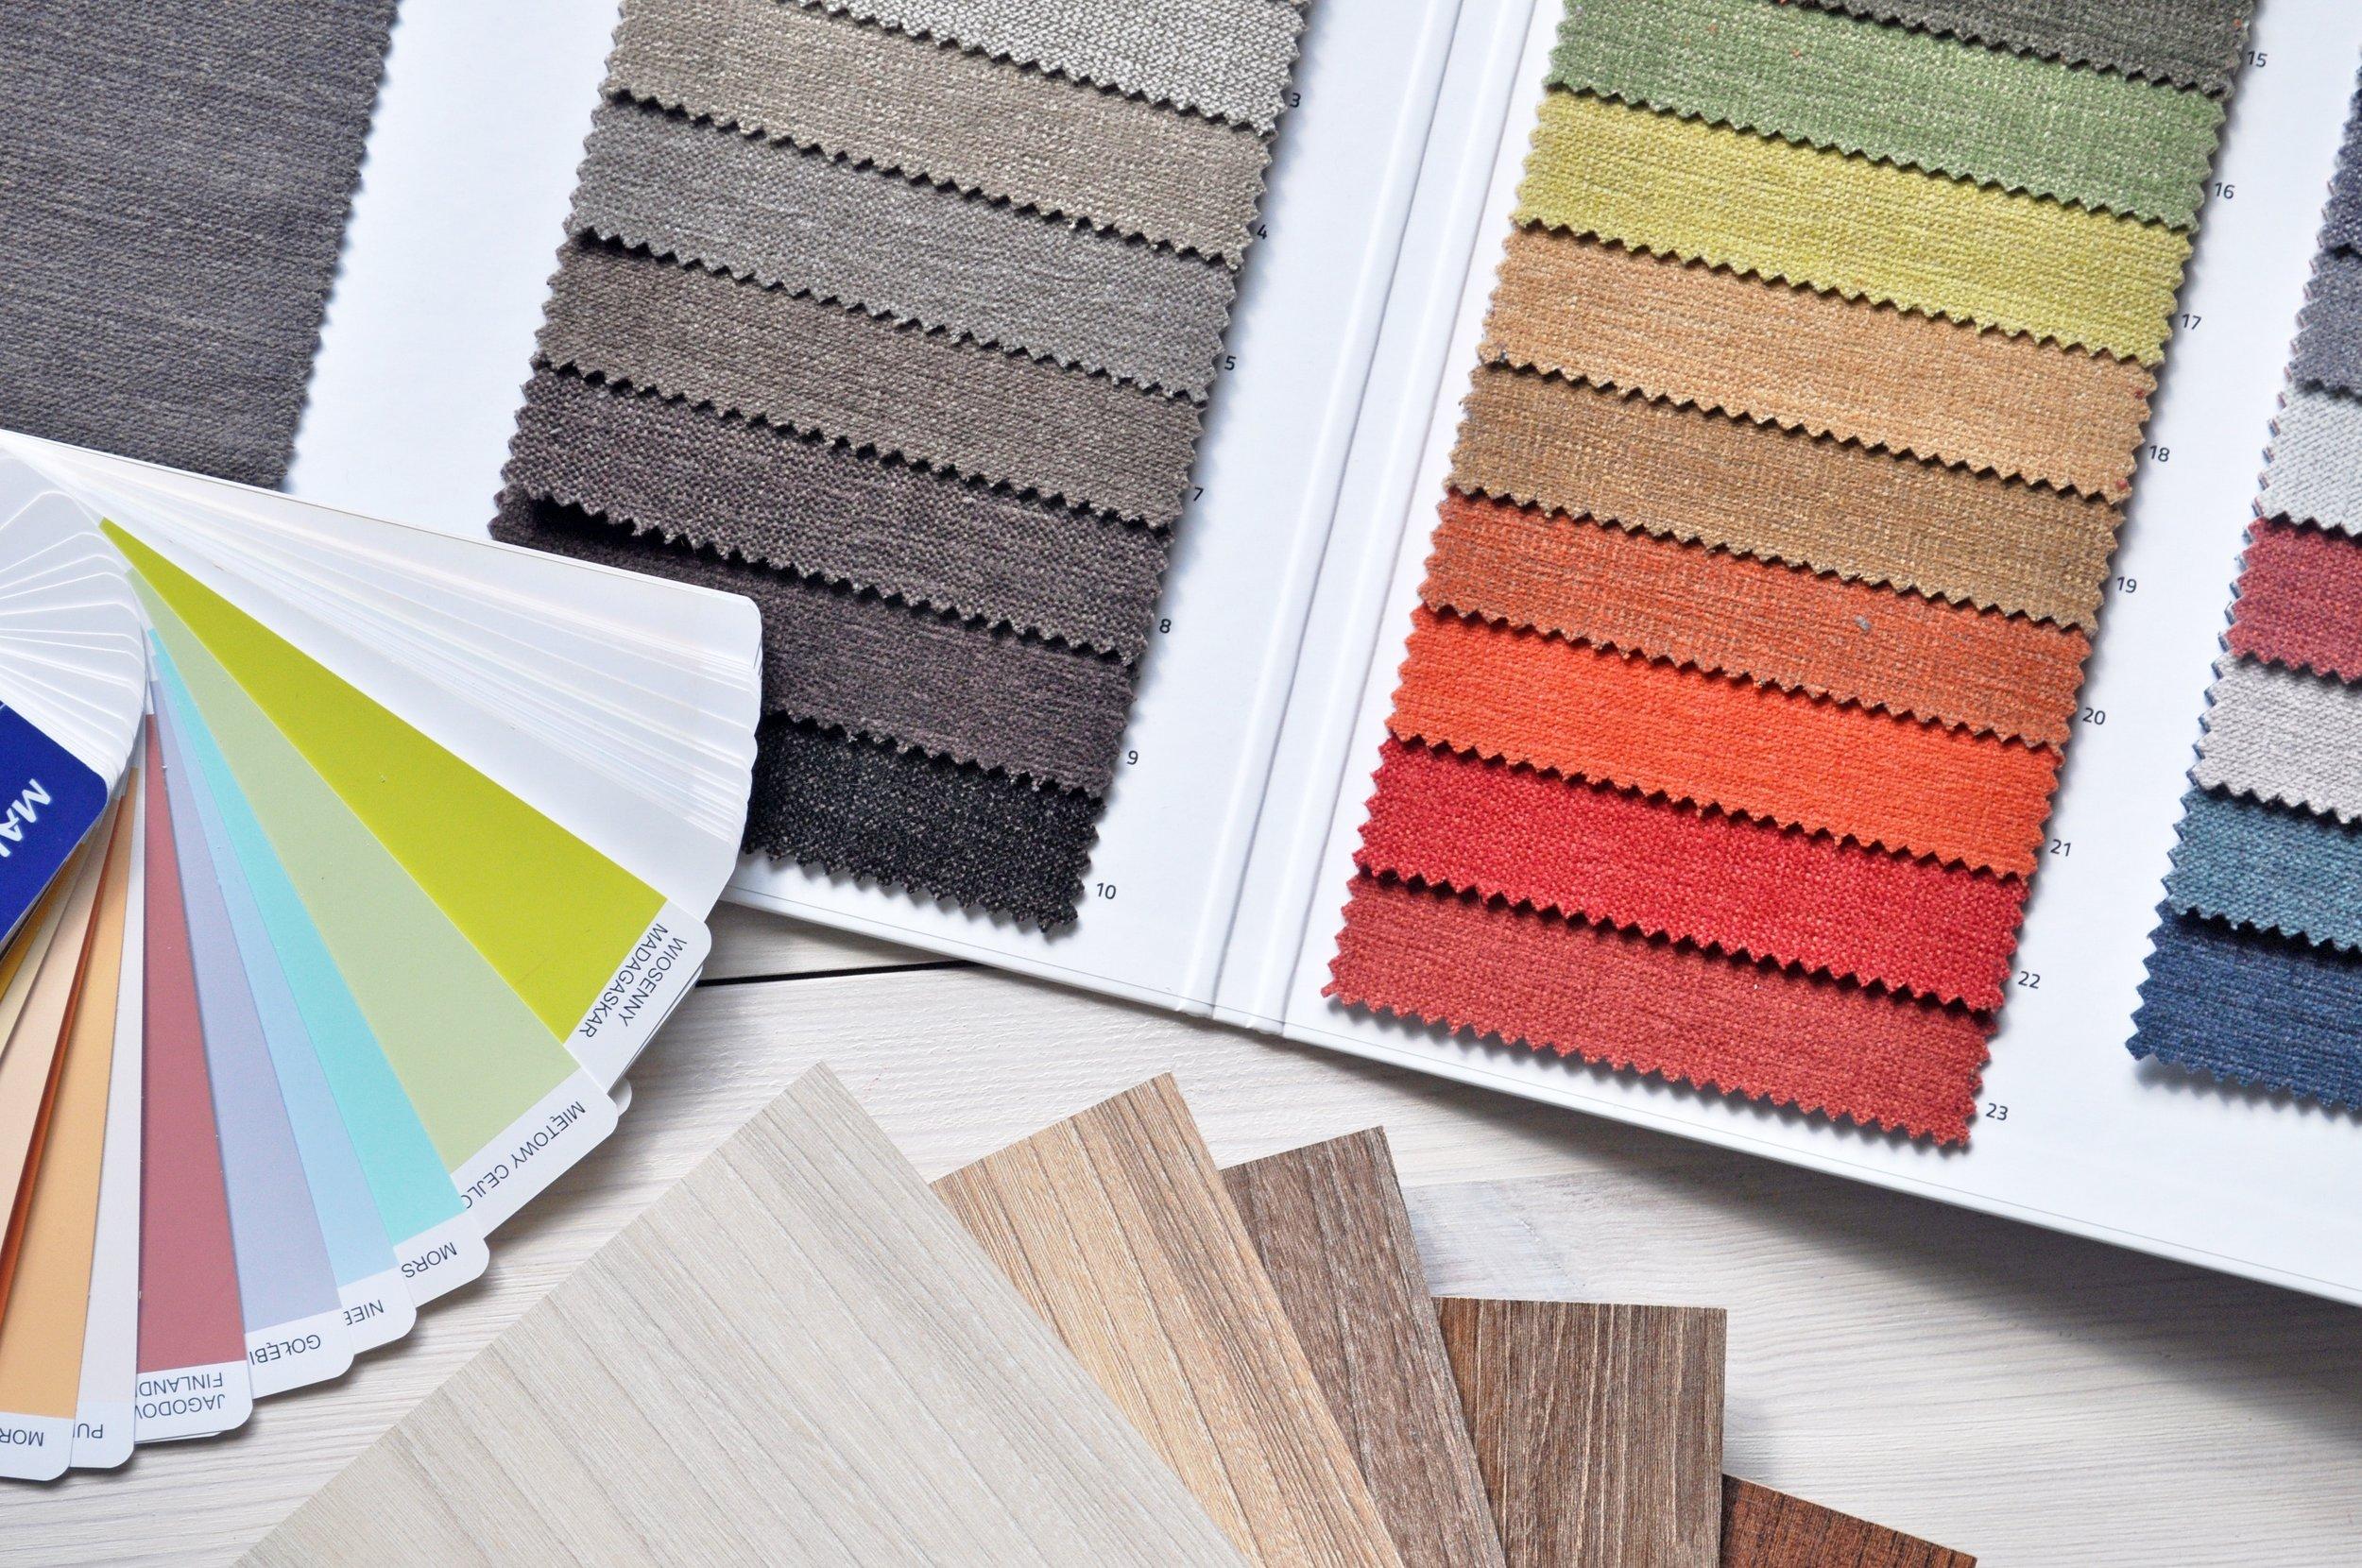 art-business-color-276267.jpg